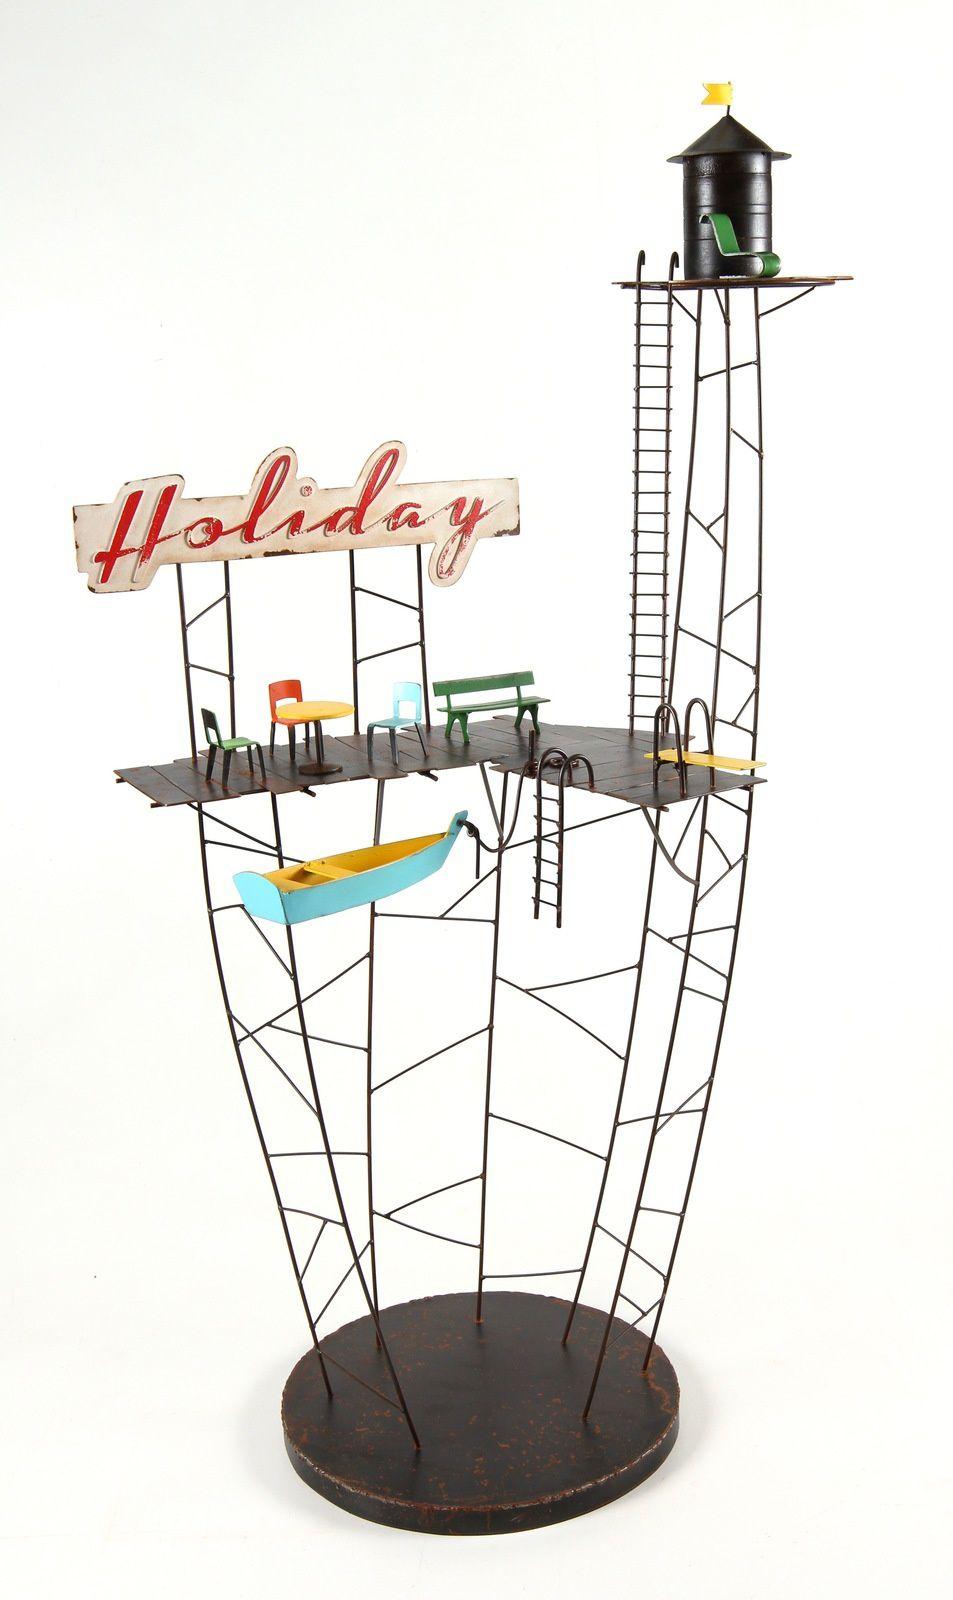 A l'usine et Holiday